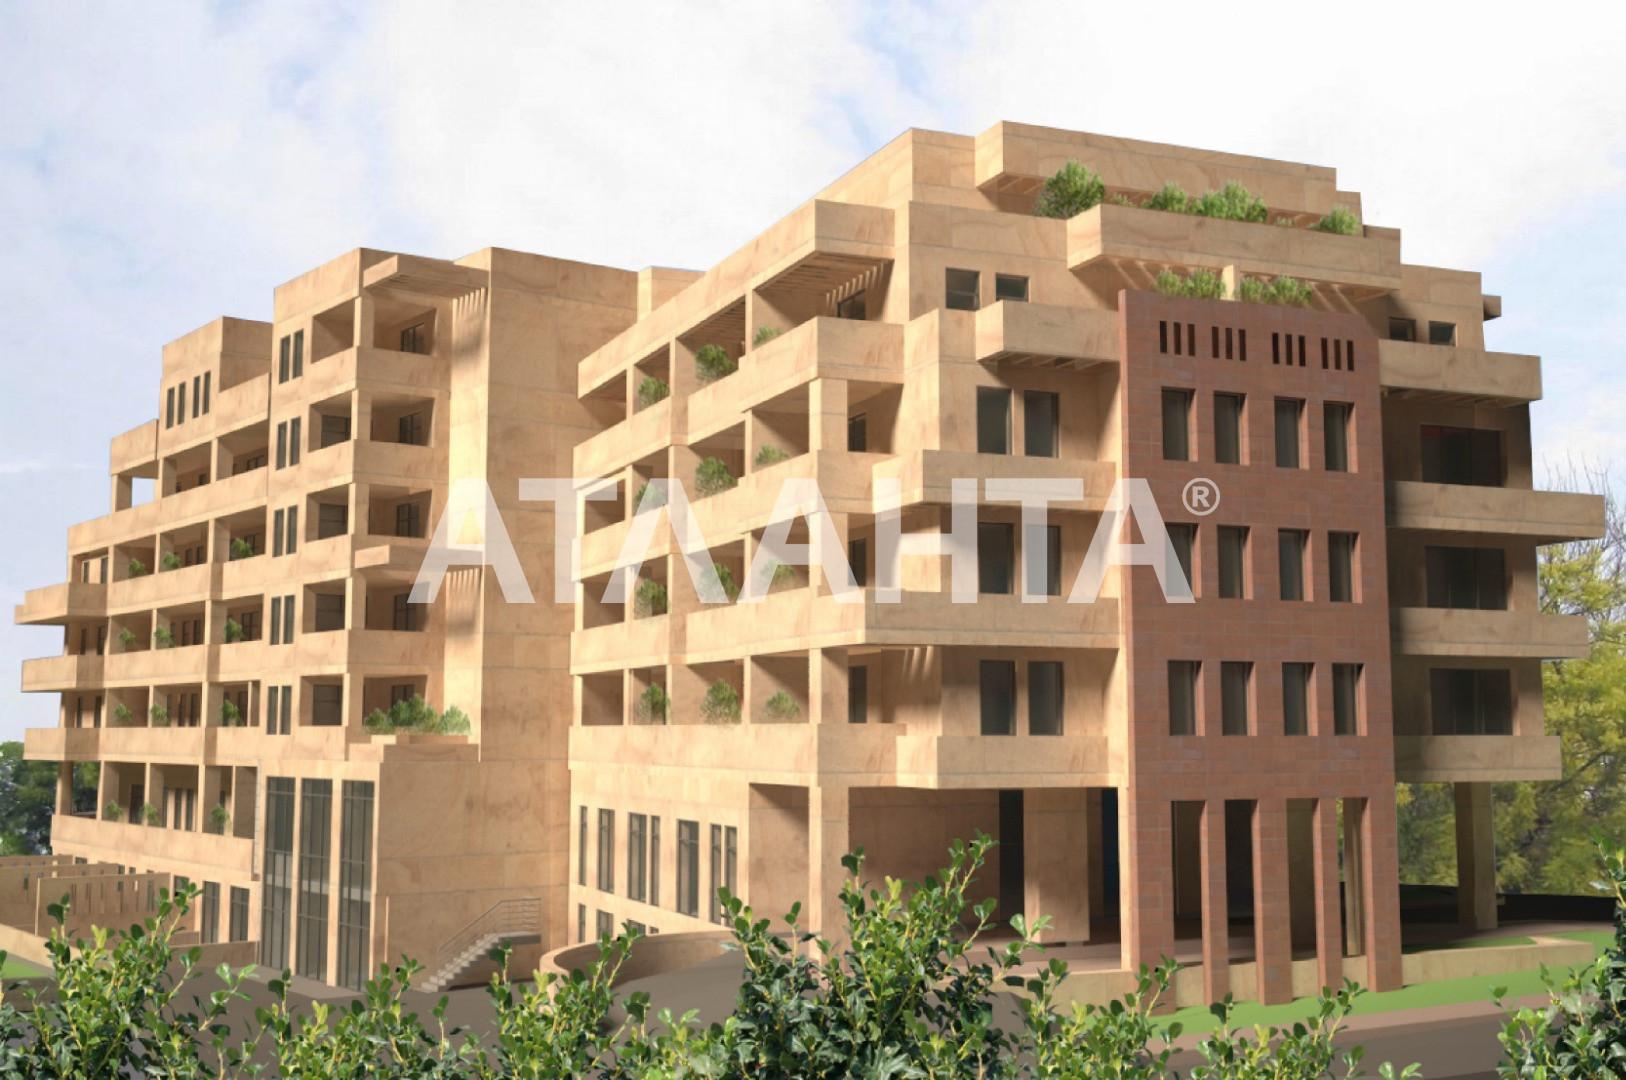 Продается 1-комнатная Квартира на ул. Каманина — 67 350 у.е.